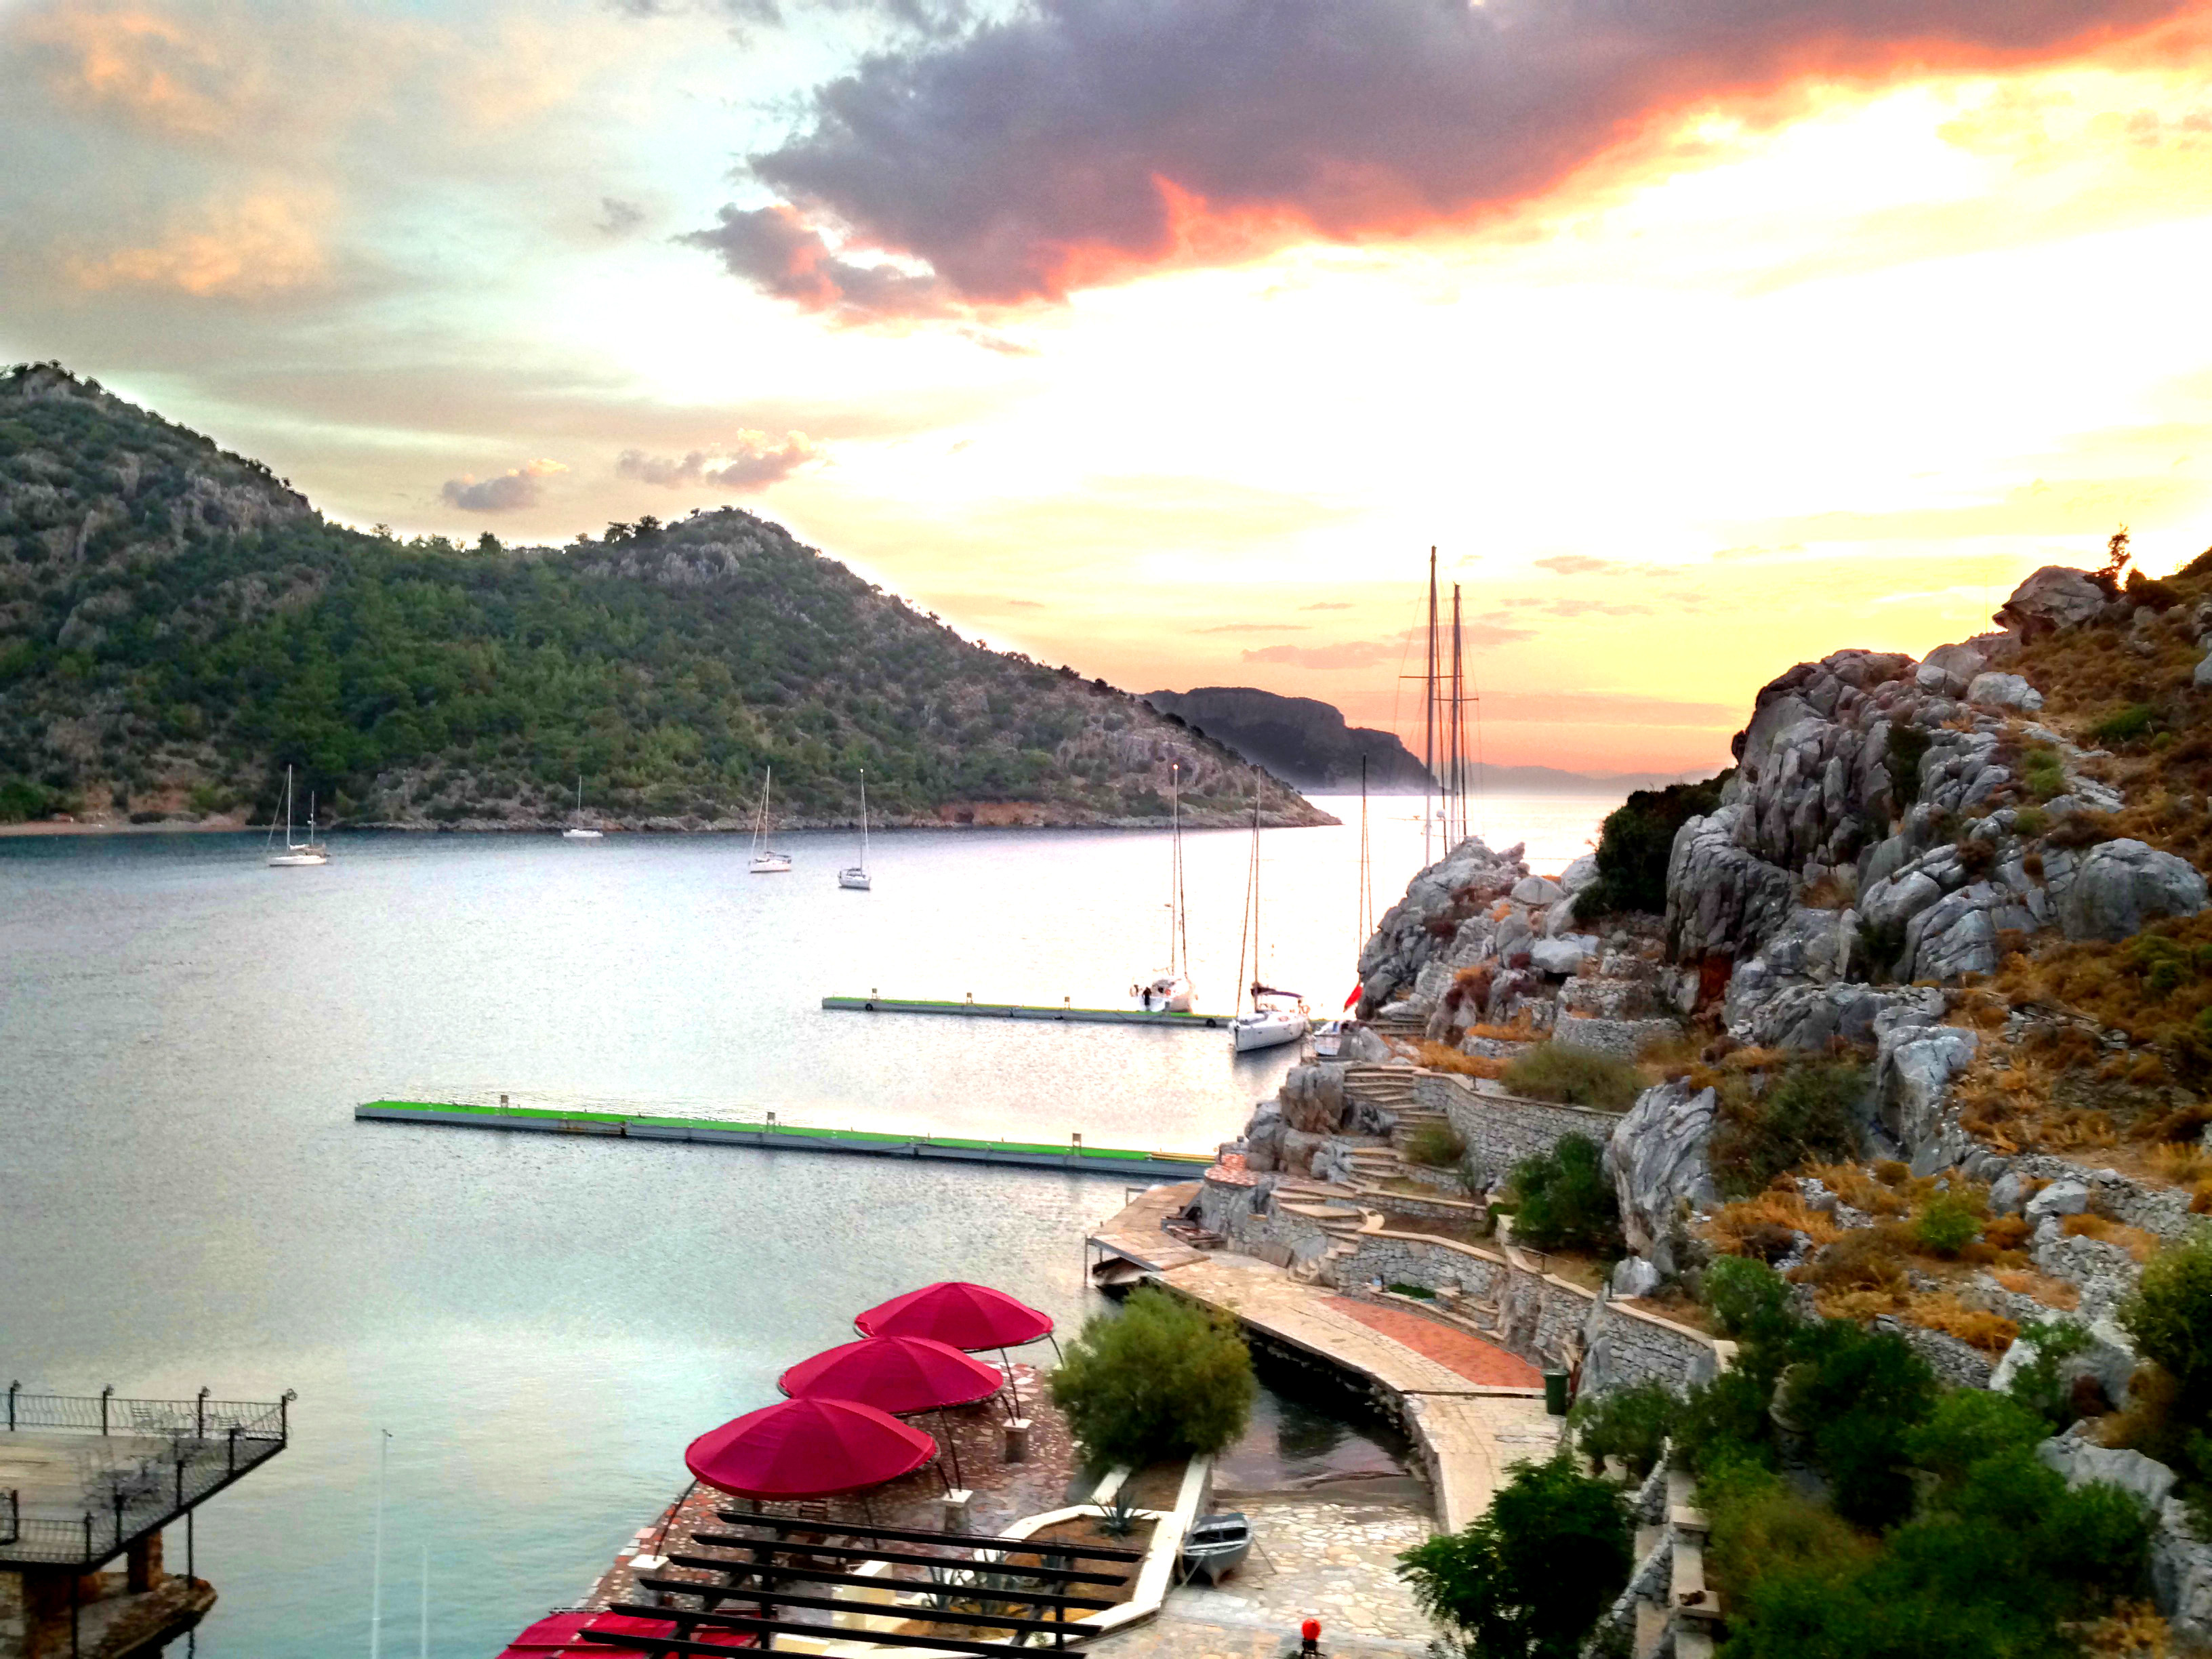 Alarga Bay View Contrast